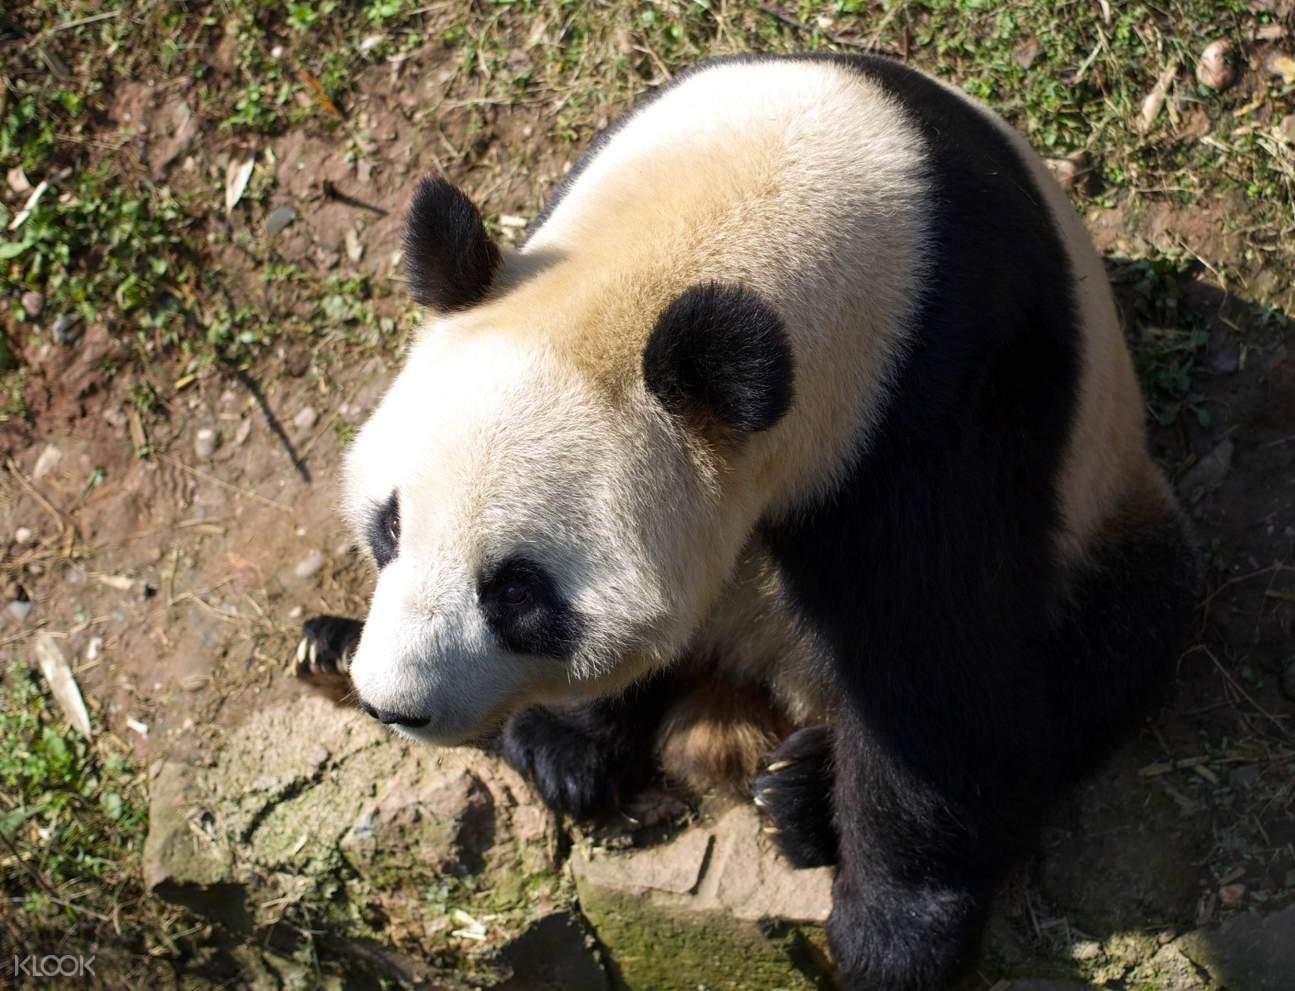 panda experience Chengdu